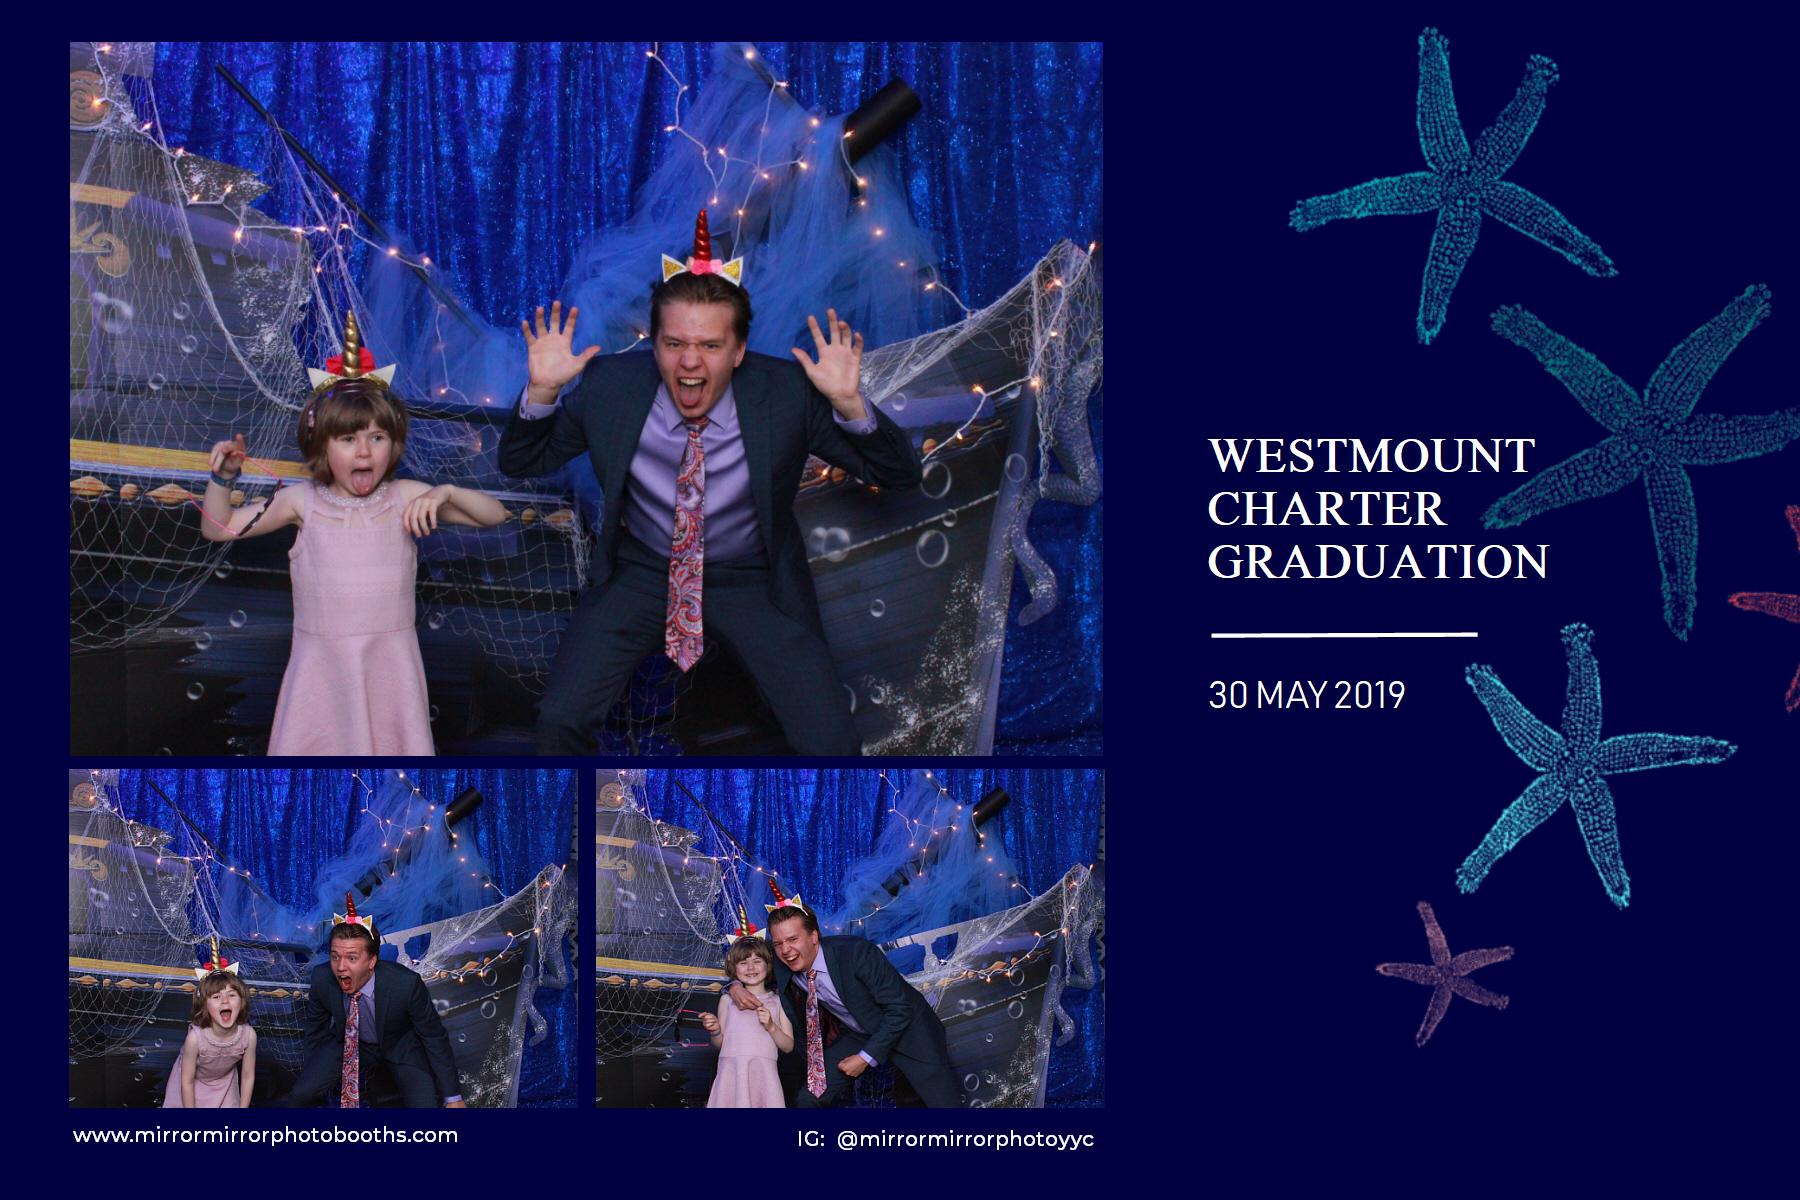 Westmount Charter Graduation - May 30, 2019